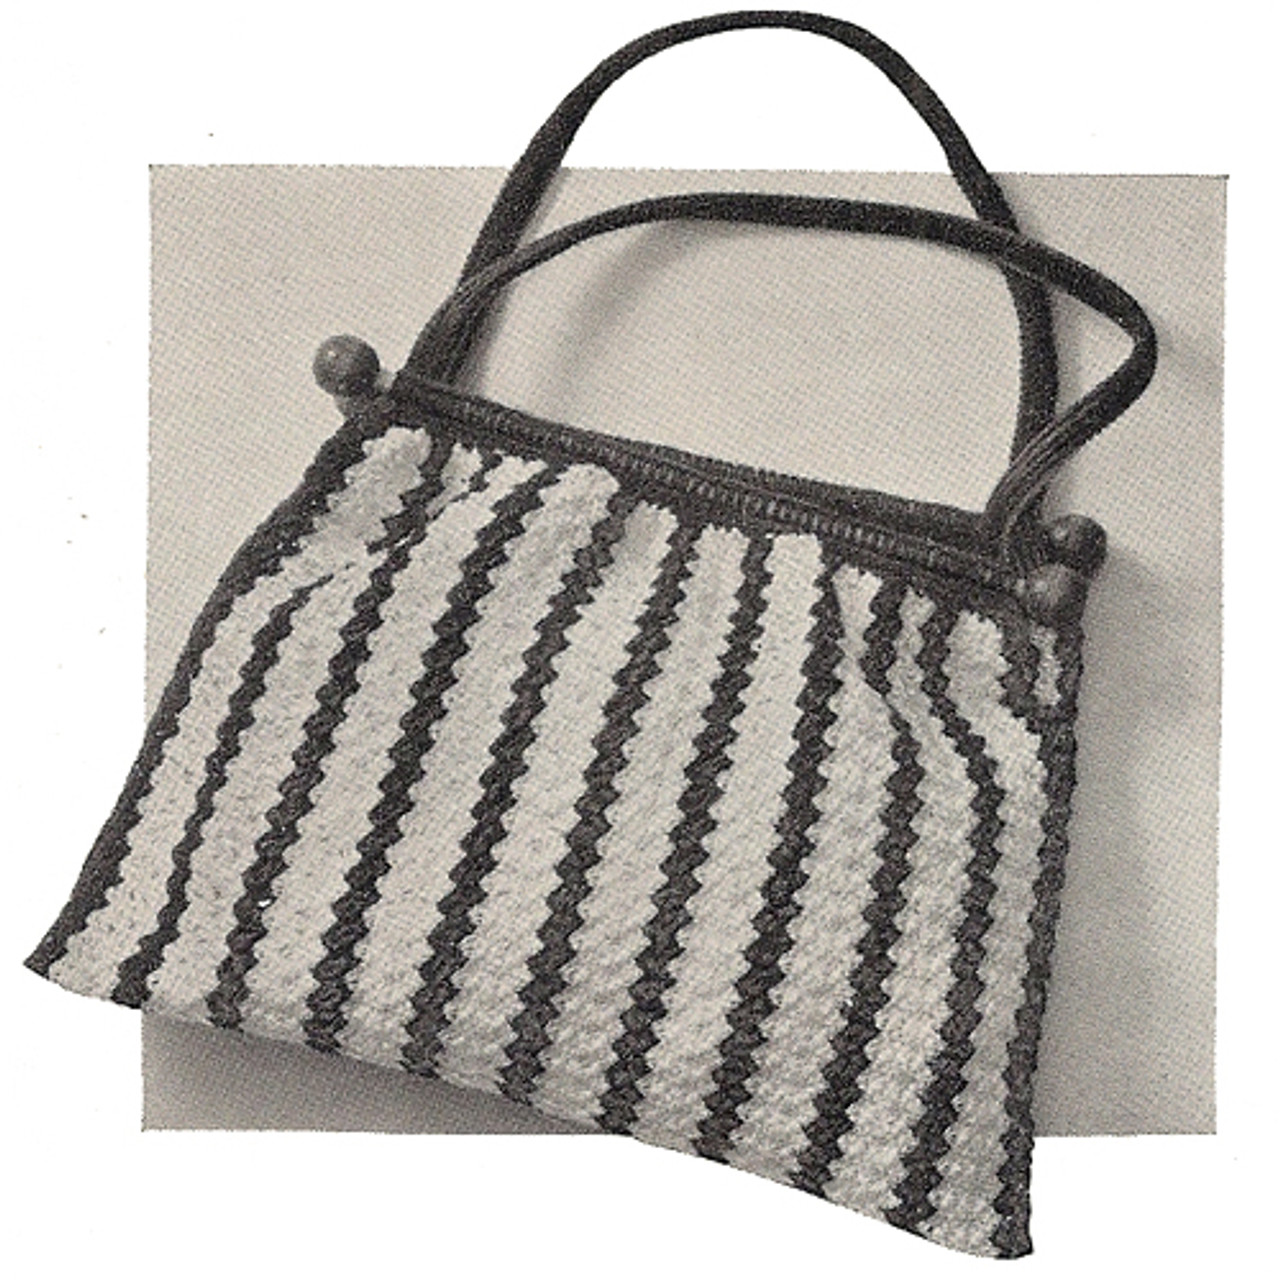 Utility Bag Crochet Pattern